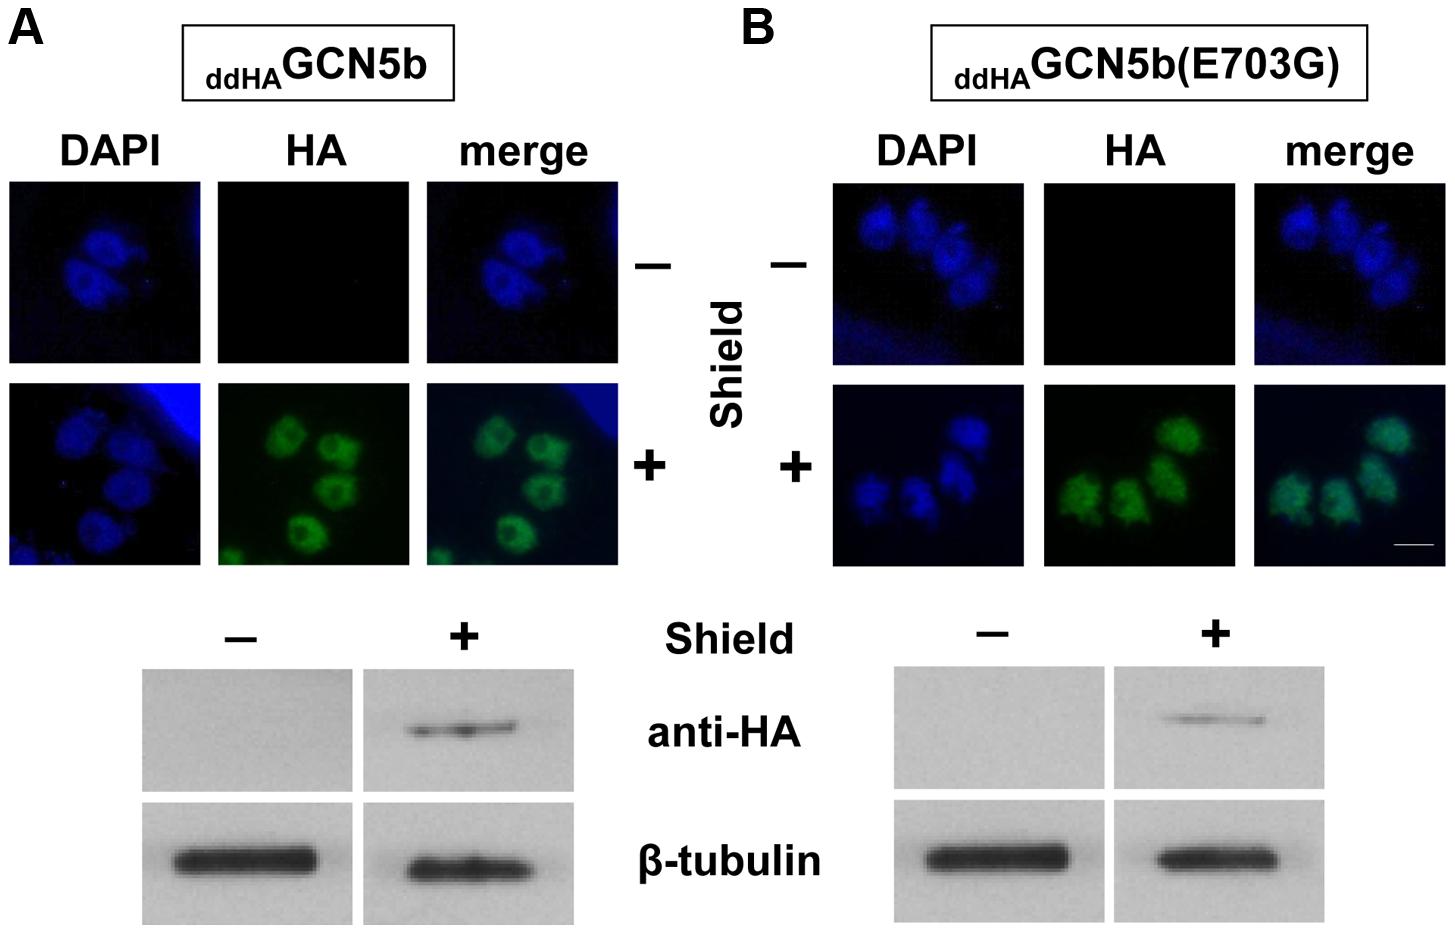 Inducible expression of ectopic <sub>ddHA</sub>GCN5b and <sub>ddHA</sub>GCN5b(E703G) in <i>Toxoplasma</i>.